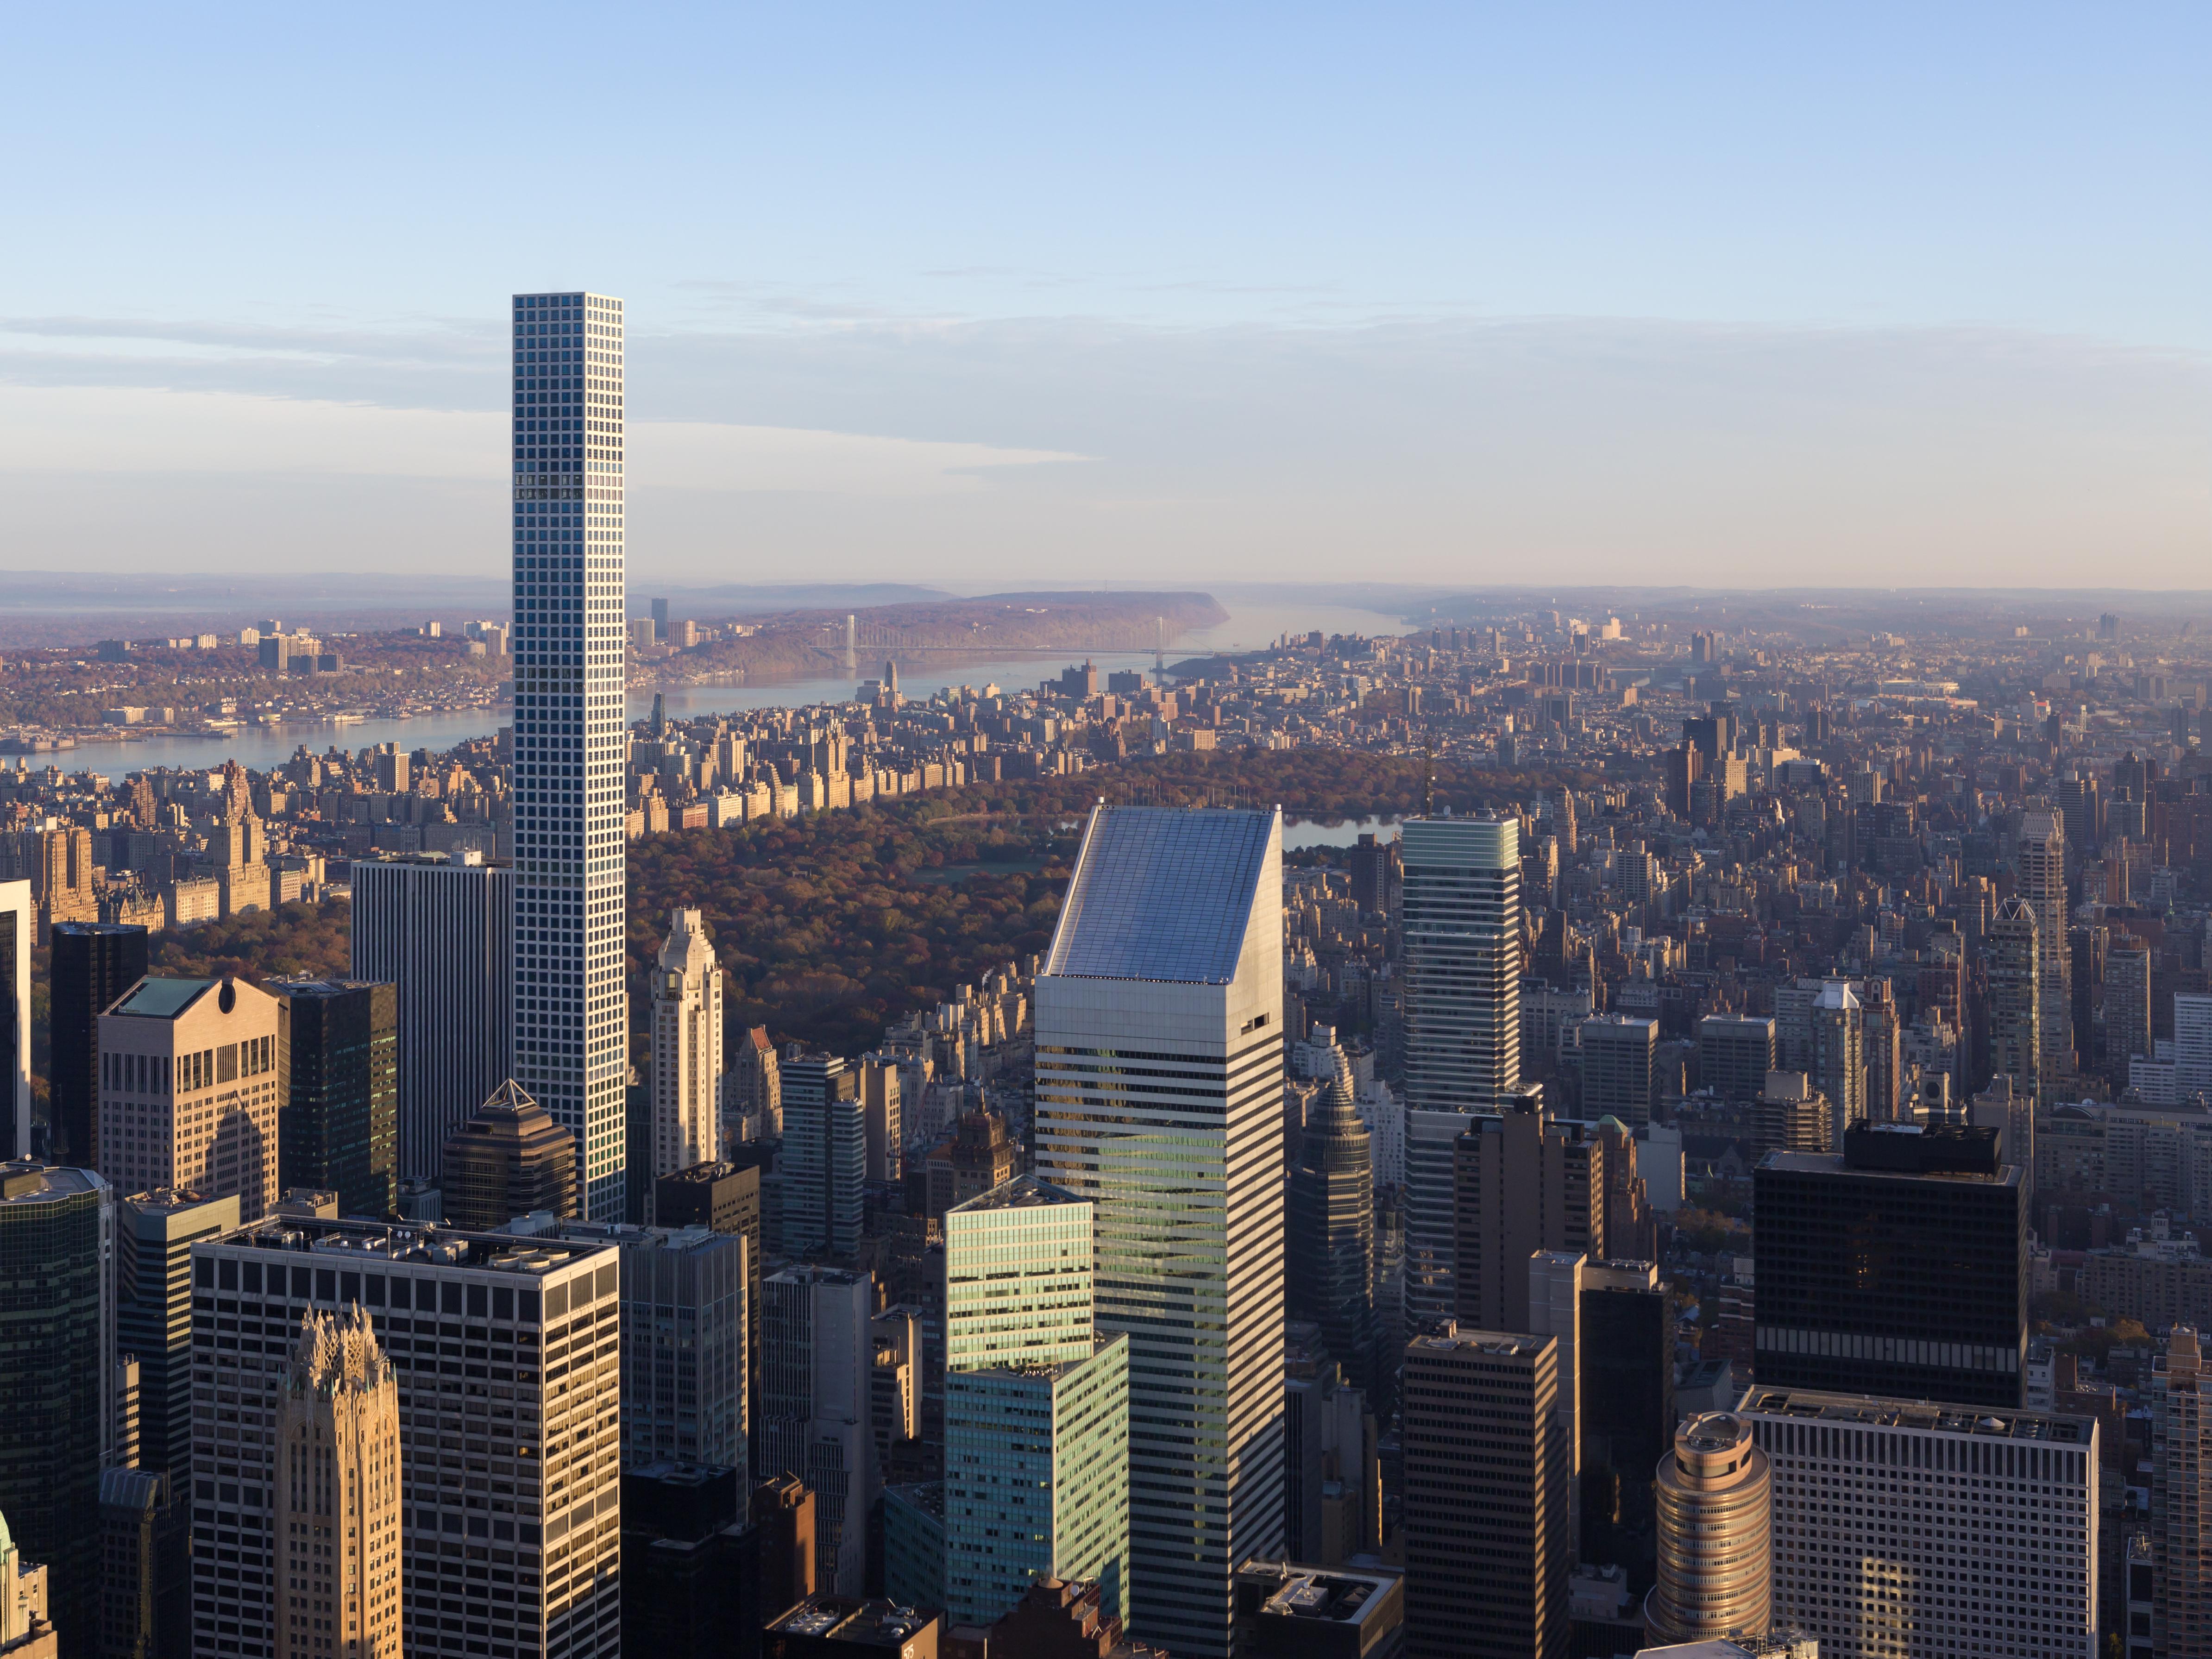 432 Park Avenue towers over Manhattan.